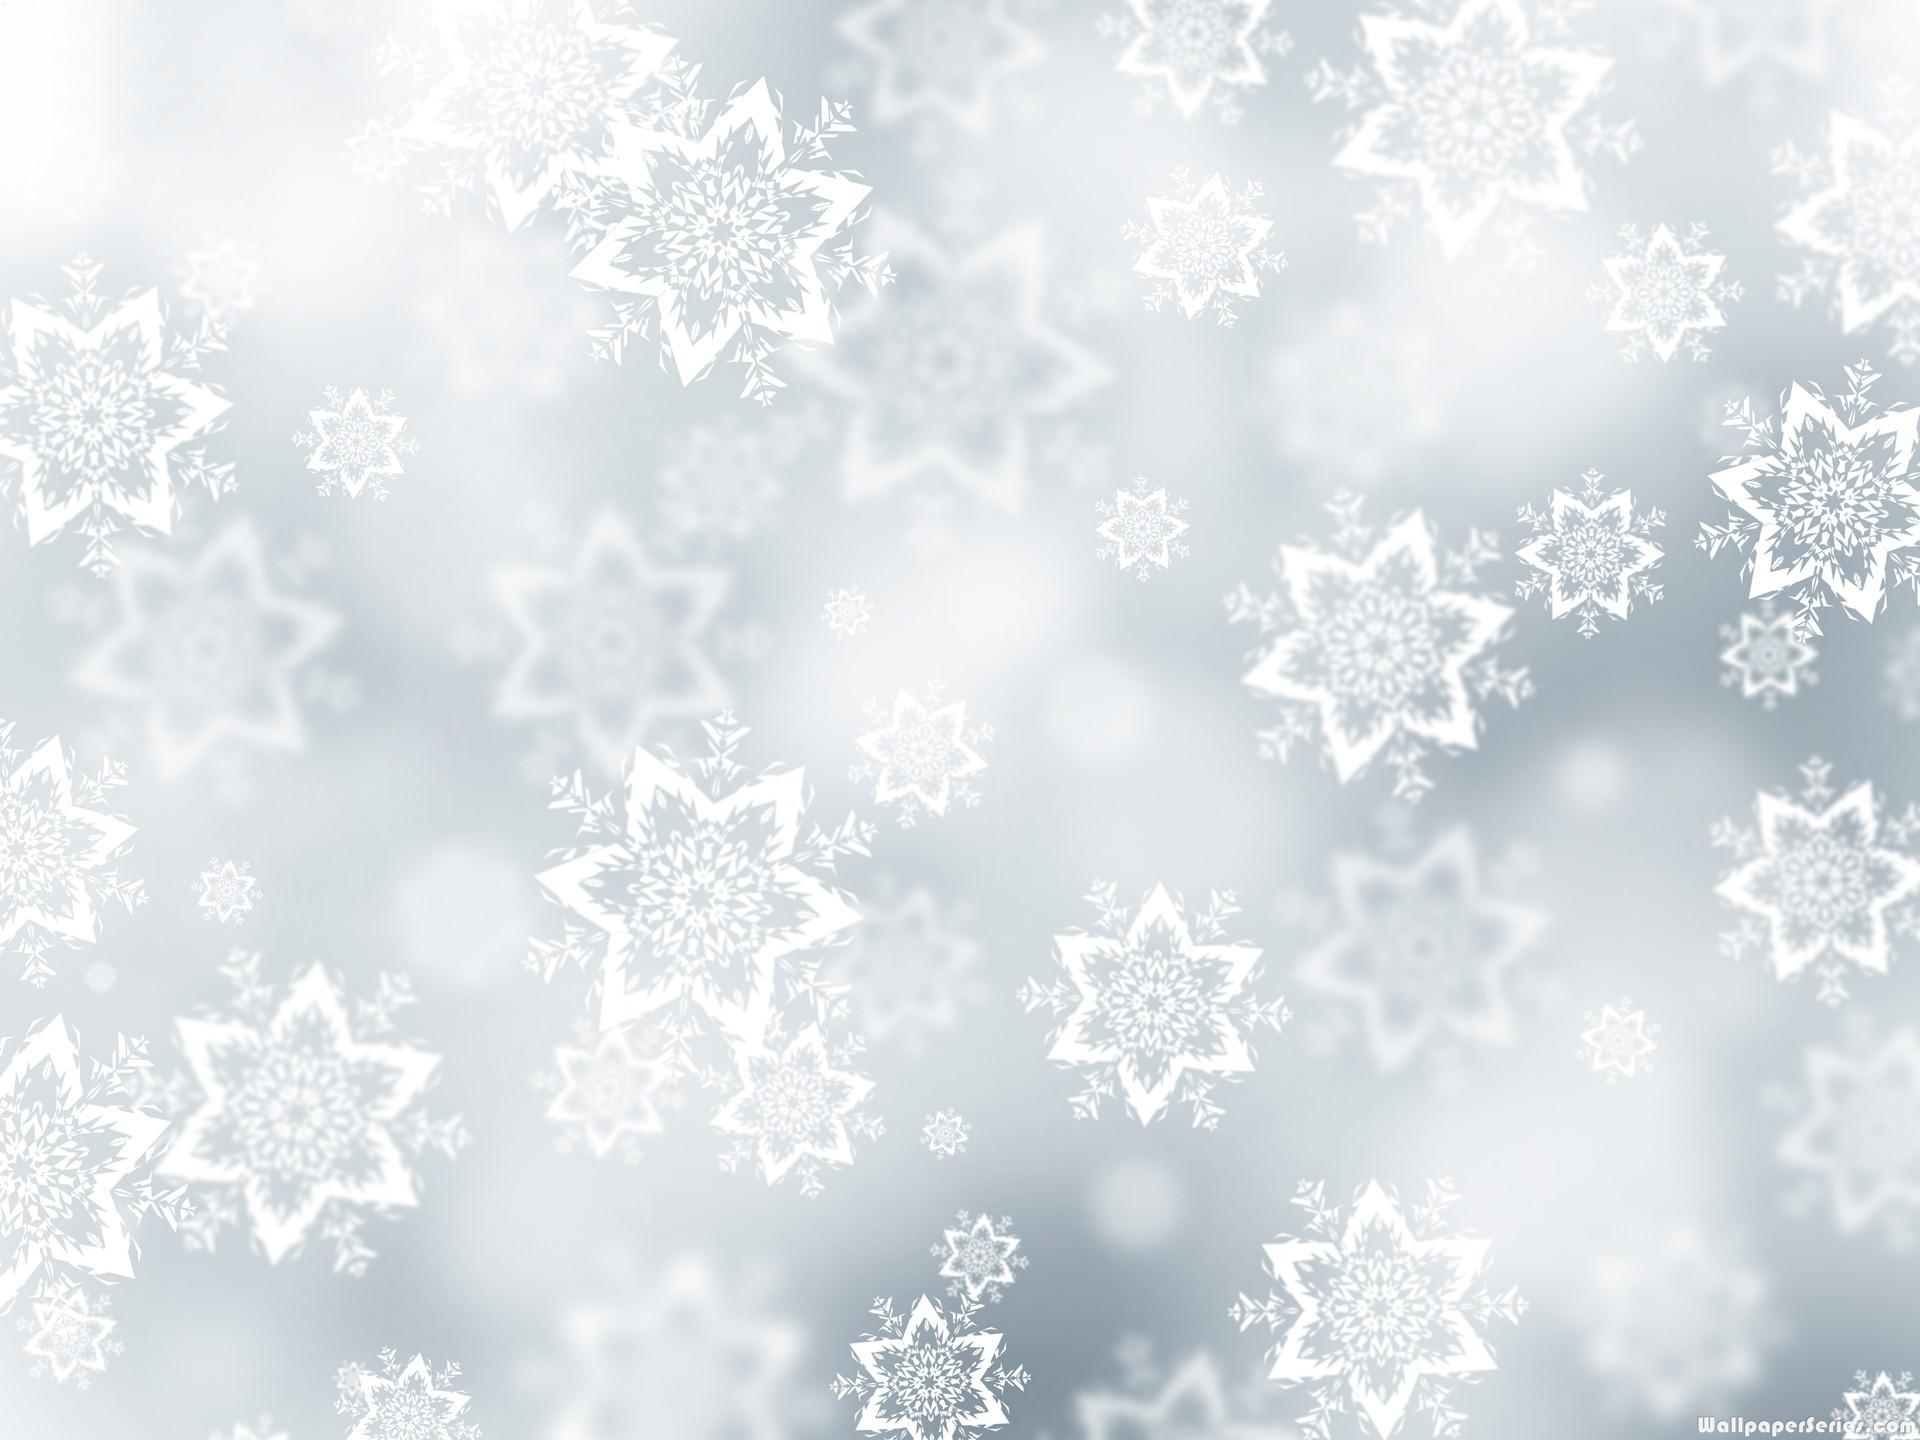 White snowflakes background vector graphics | My Free ... |White Snowflake Wallpaper